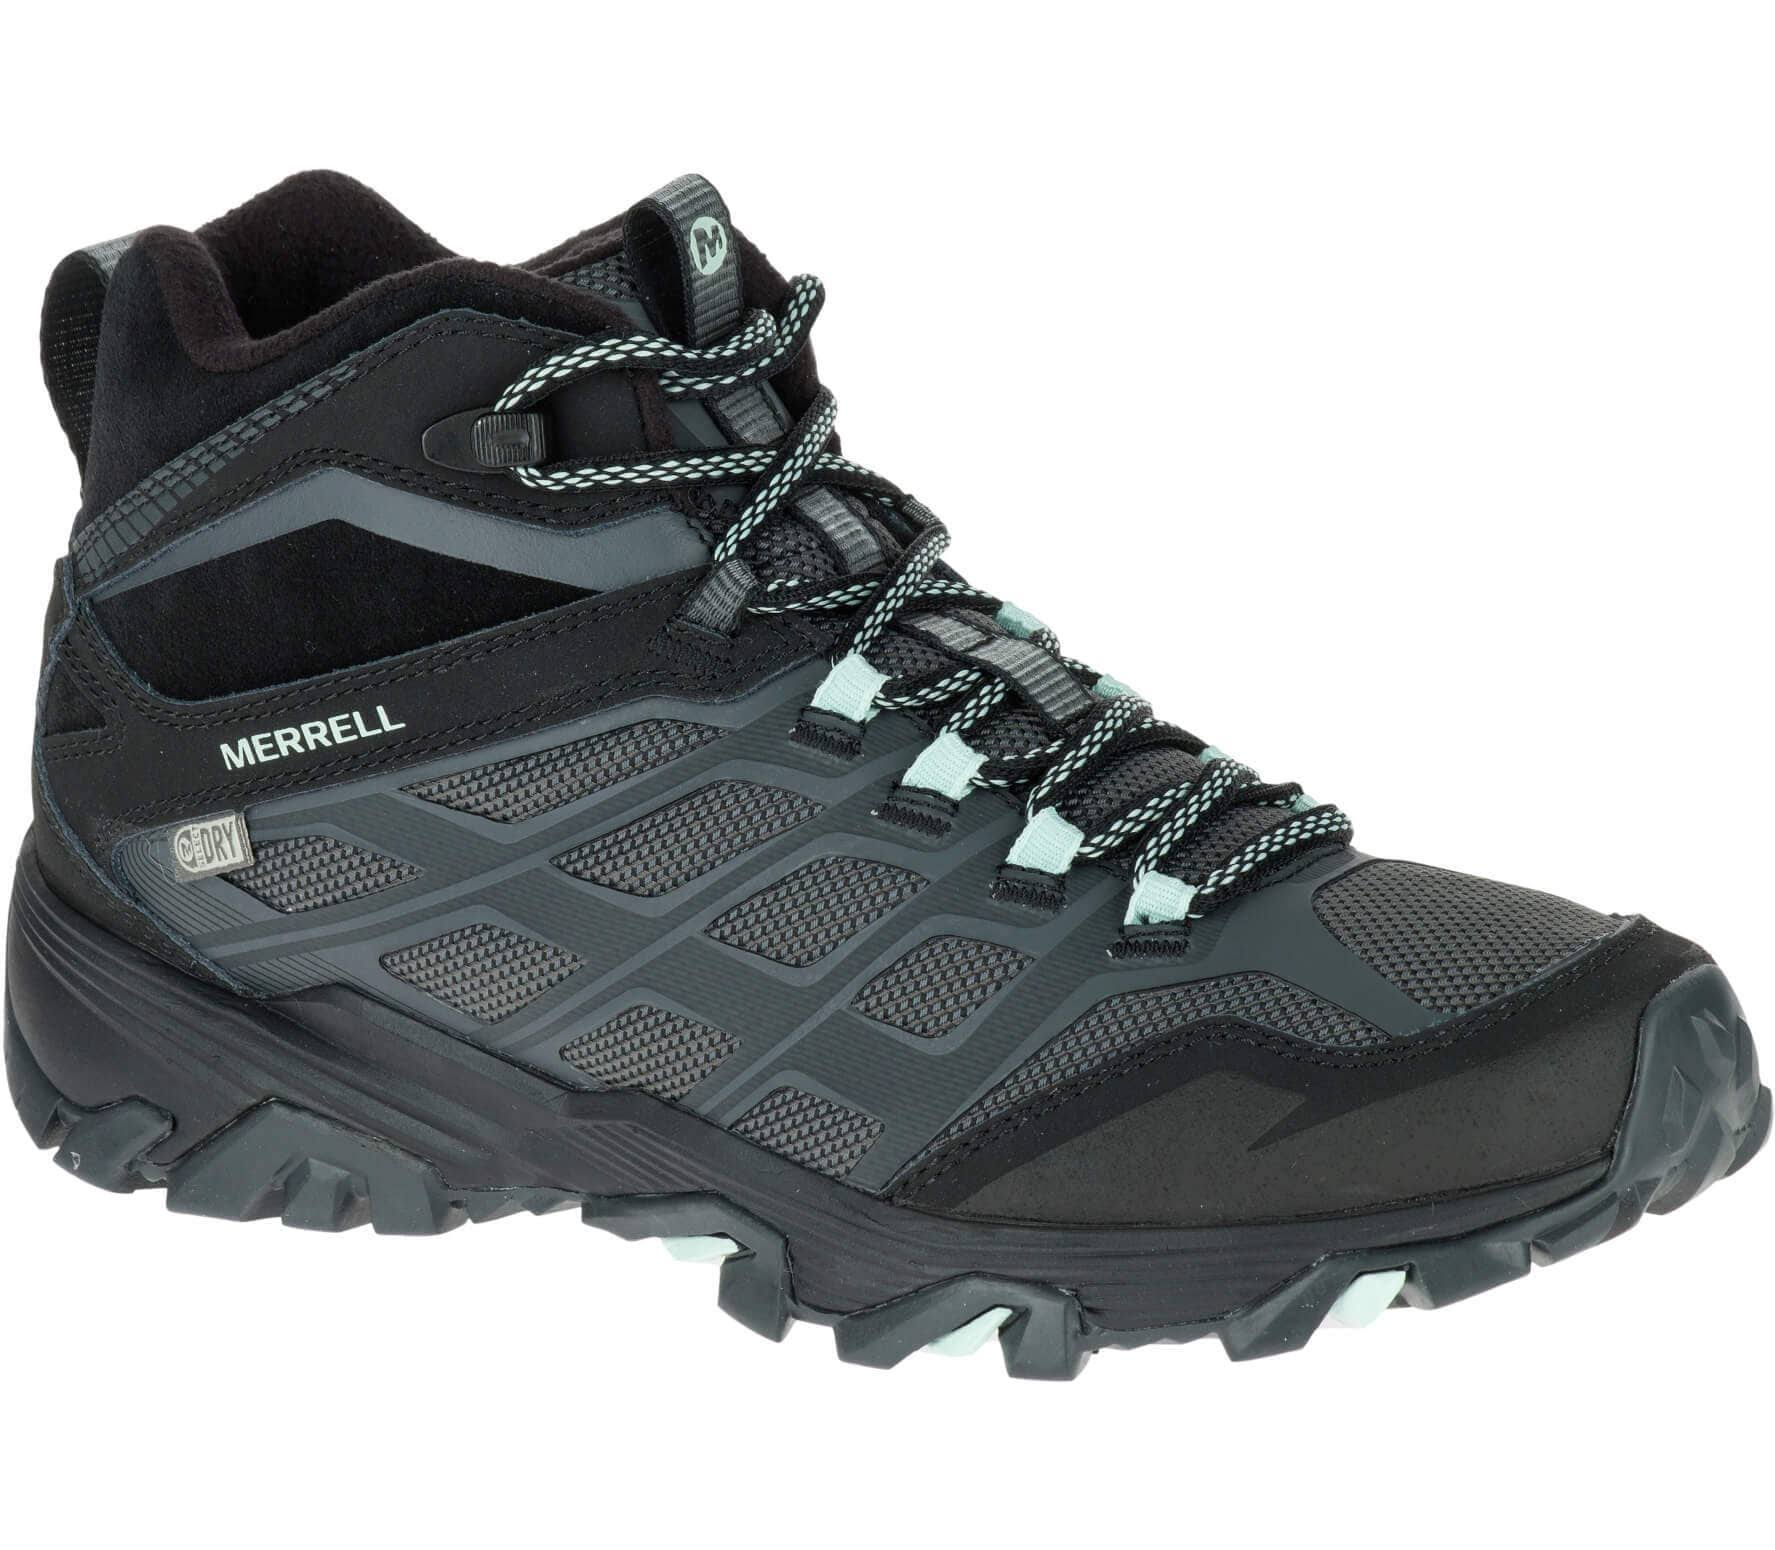 Boots DonnaMoab Fst Ice Thermo Walking Isolato Merrell Grigio hQrCdtsx